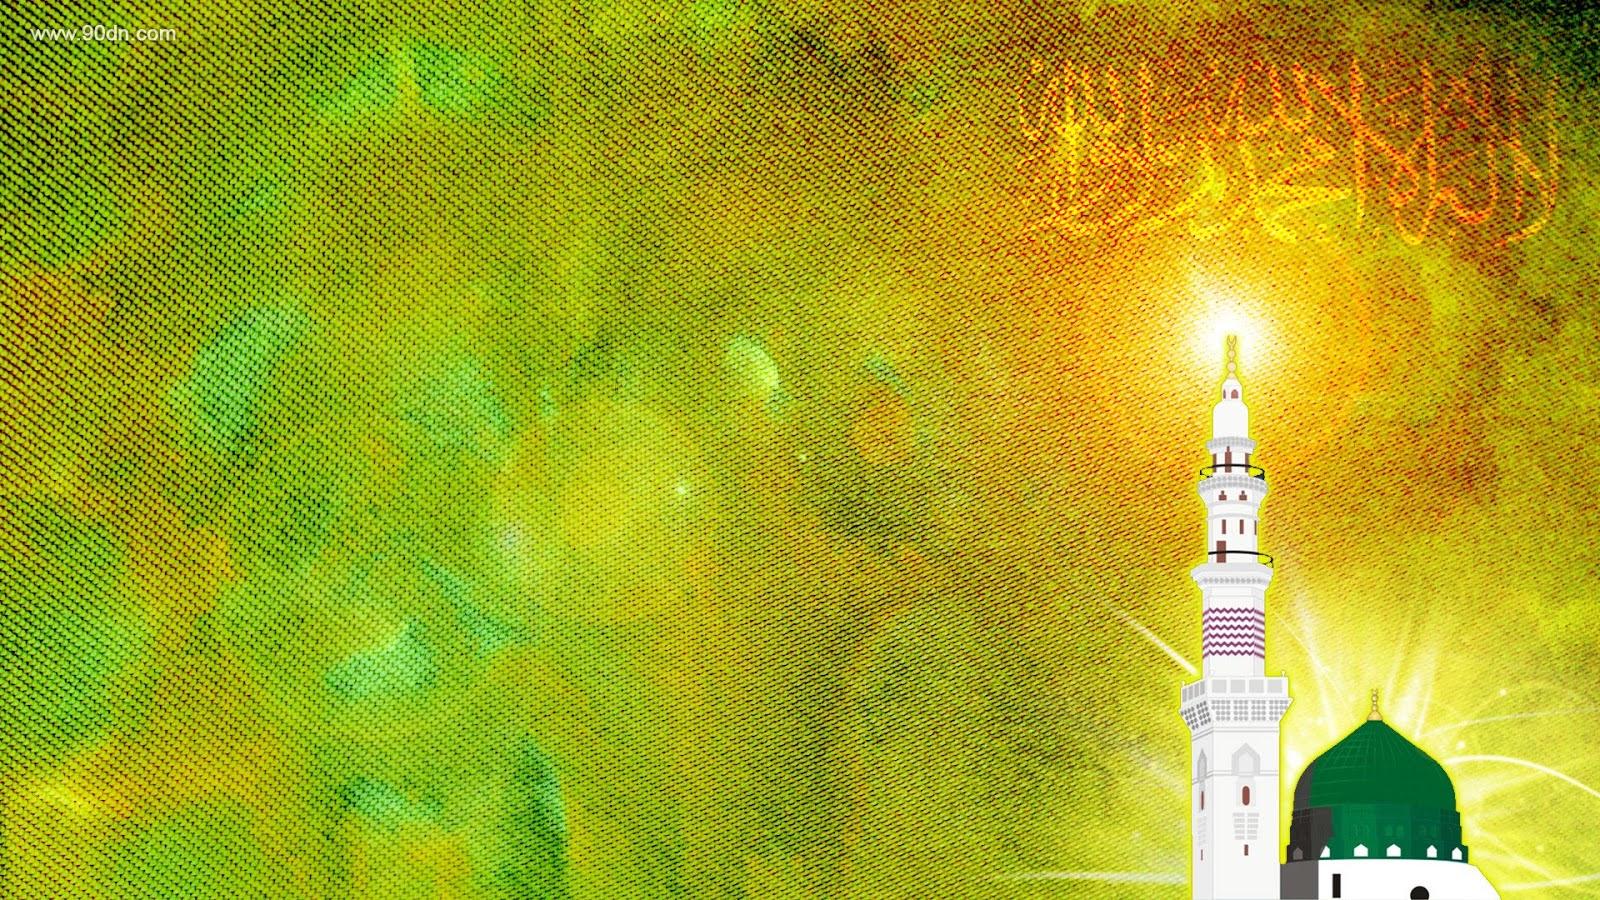 Islami Duniaa: Artificial Islamic HD Wallpaper